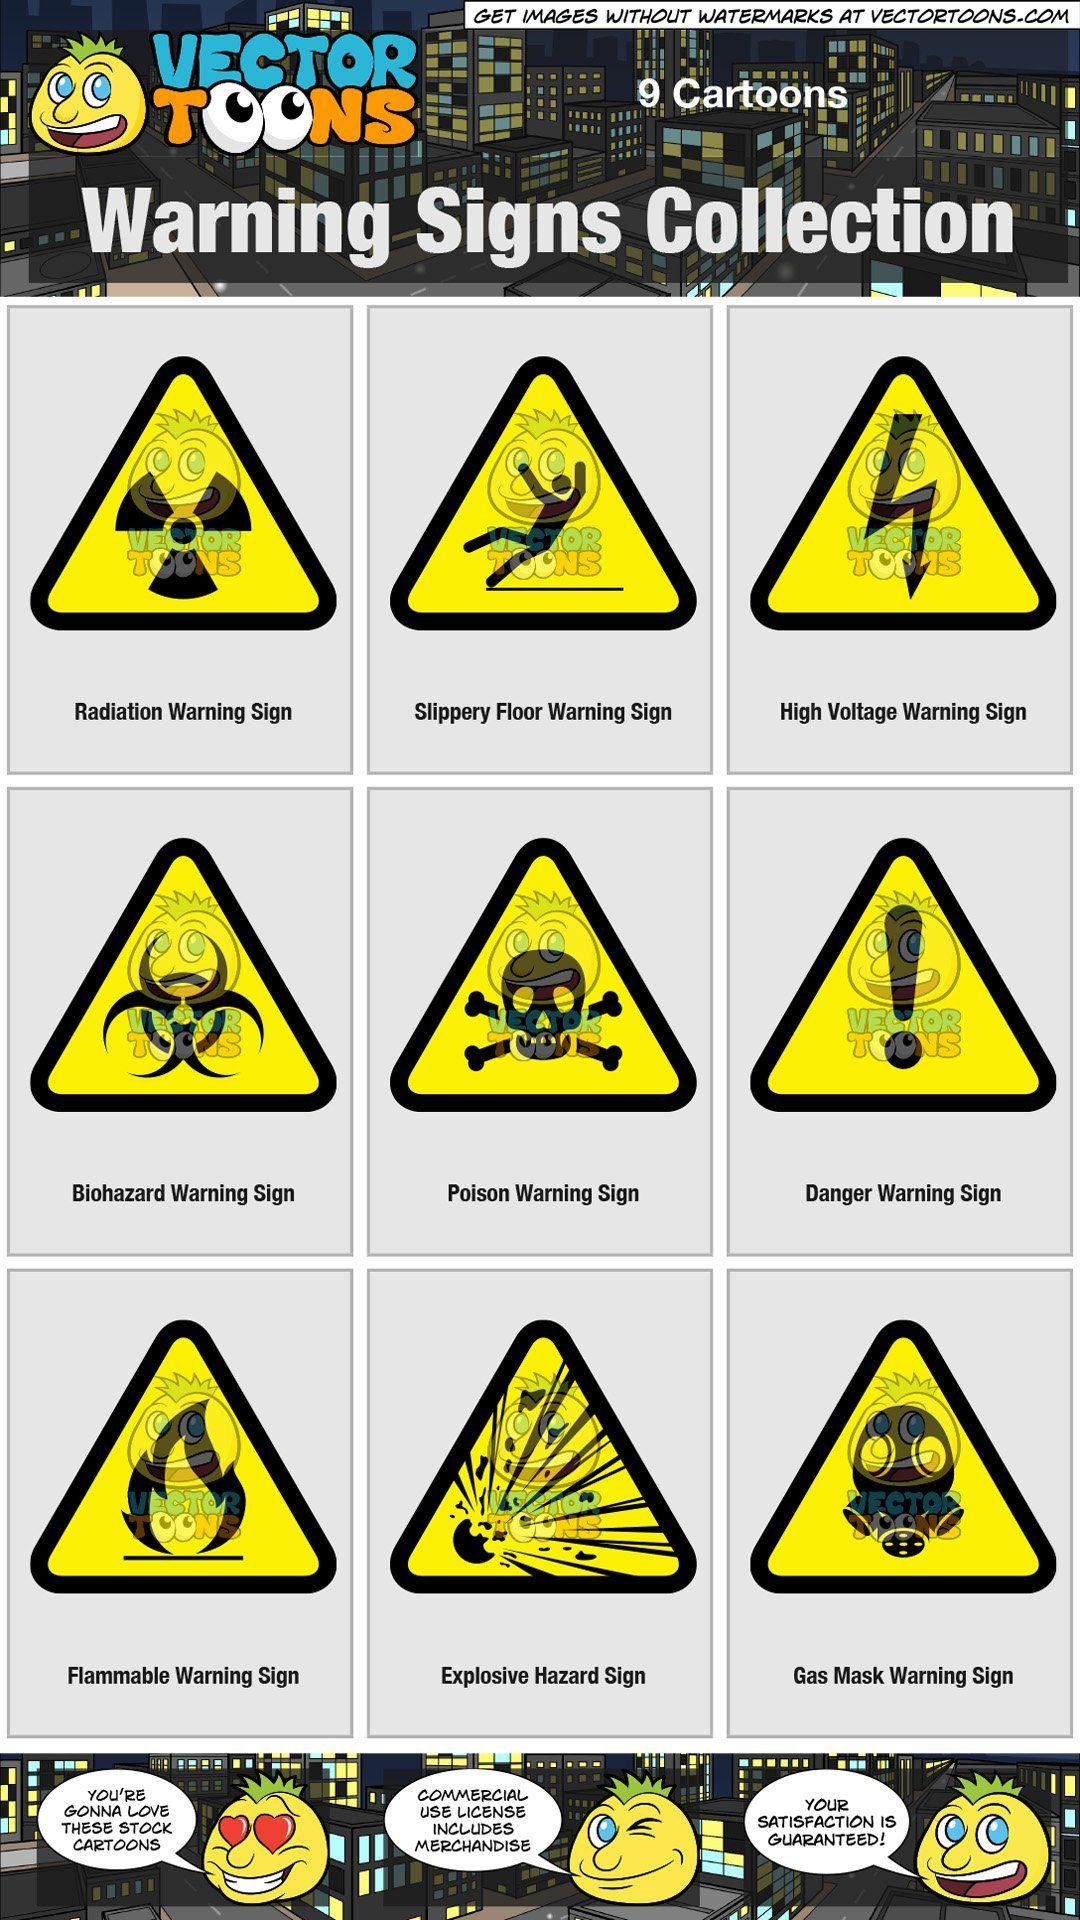 Warning Signs Collection Hazard Sign Warning Signs Signs